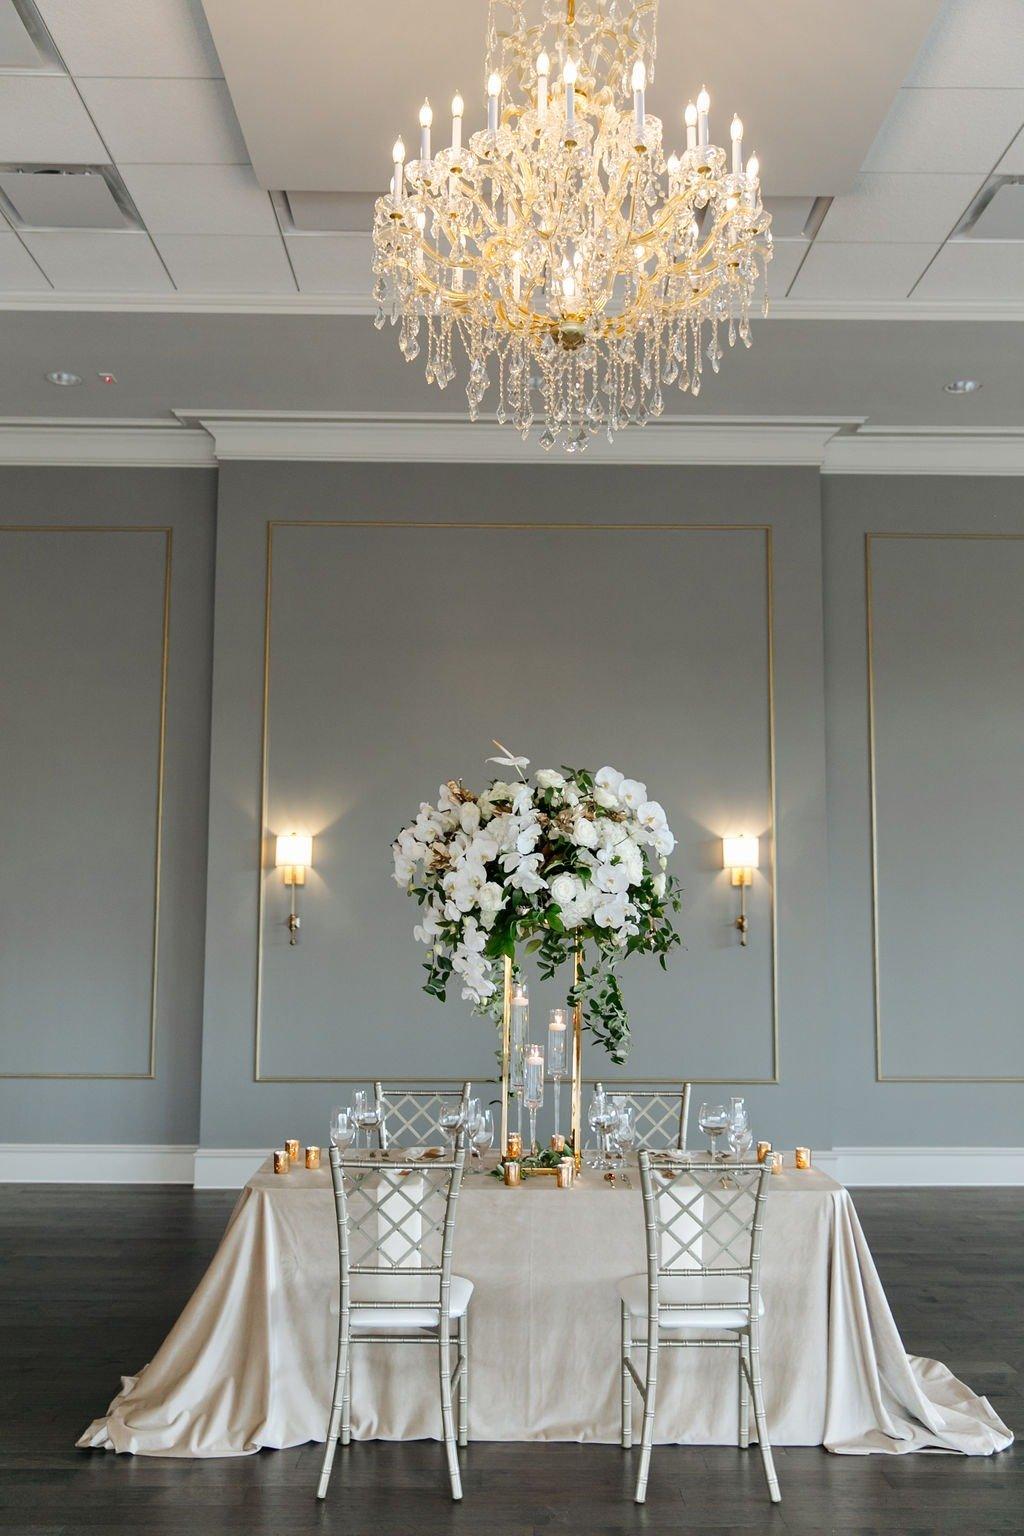 Monclair Event Venue - Dallas, Texas - French Style Wedding Venue - DFW Venue